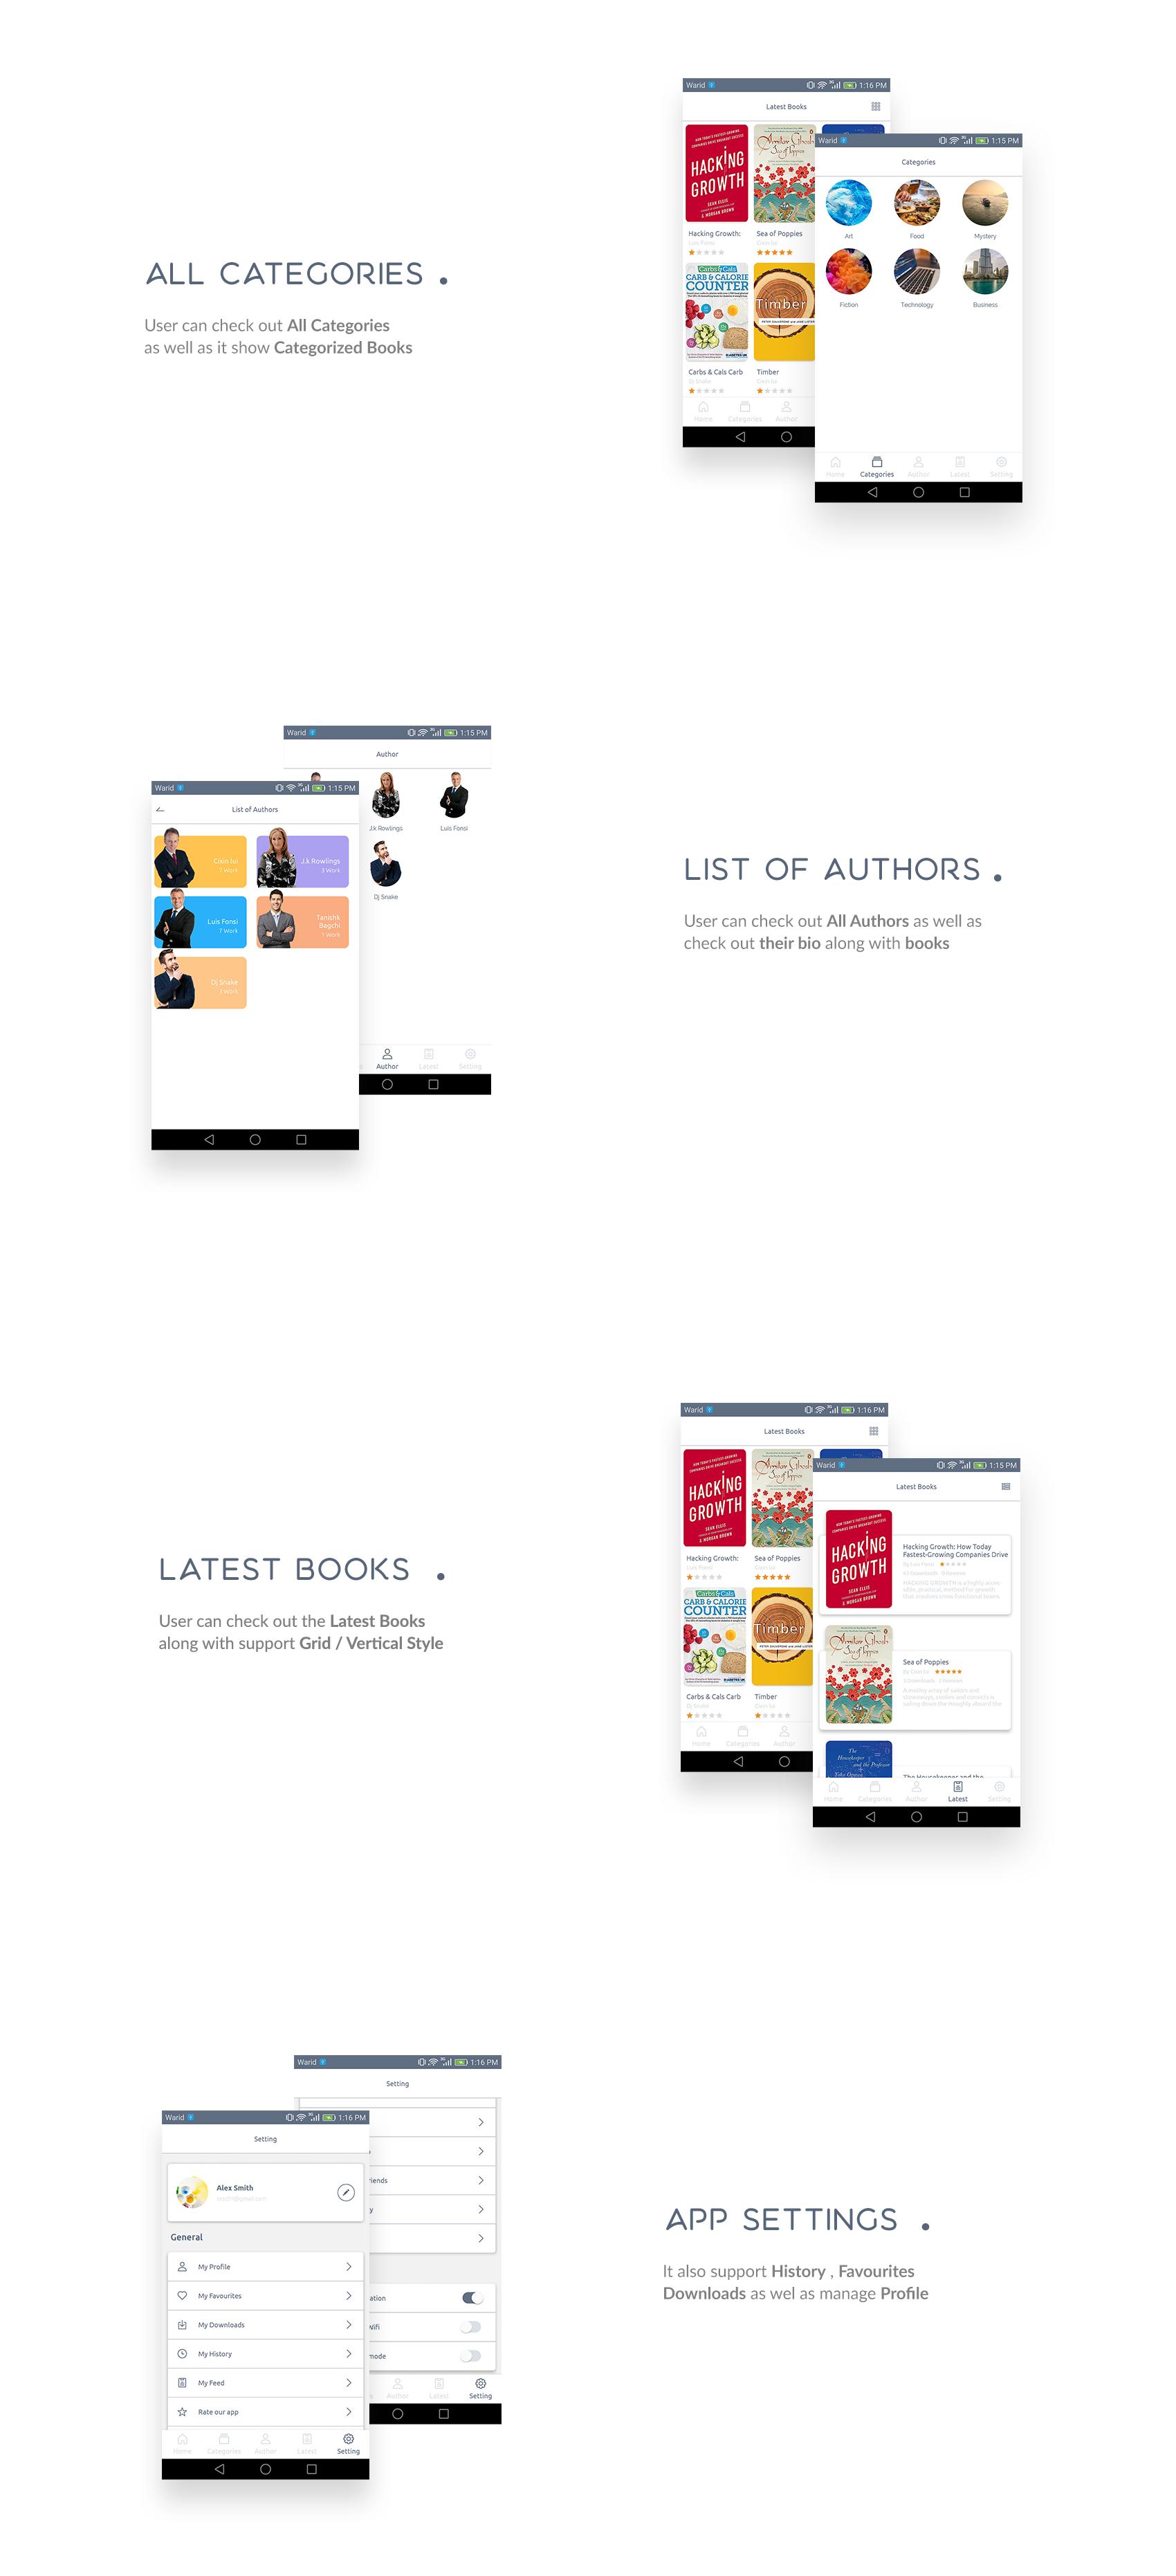 Books4u - Android Ebook App + Admin panel - 4